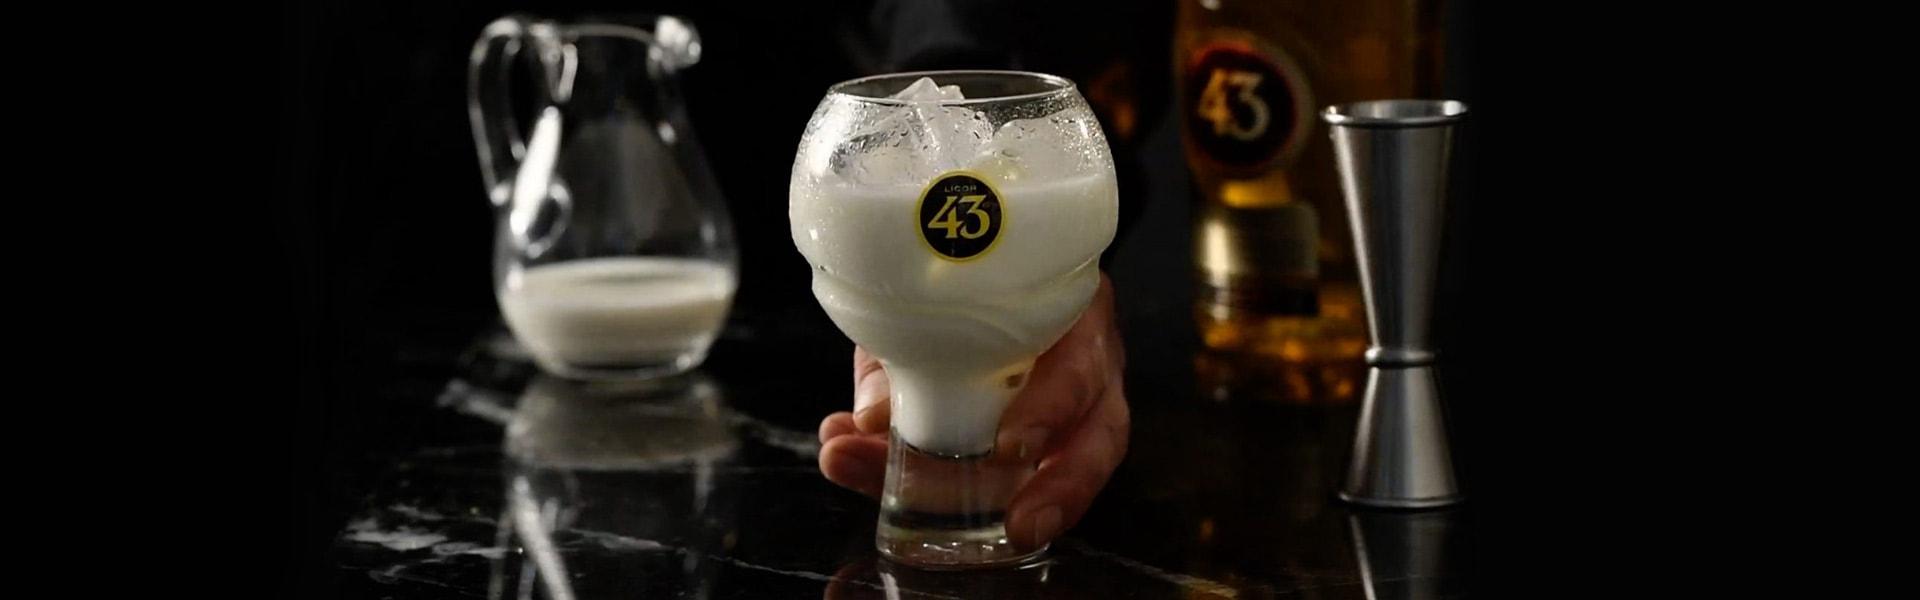 Licor 43 Blanco